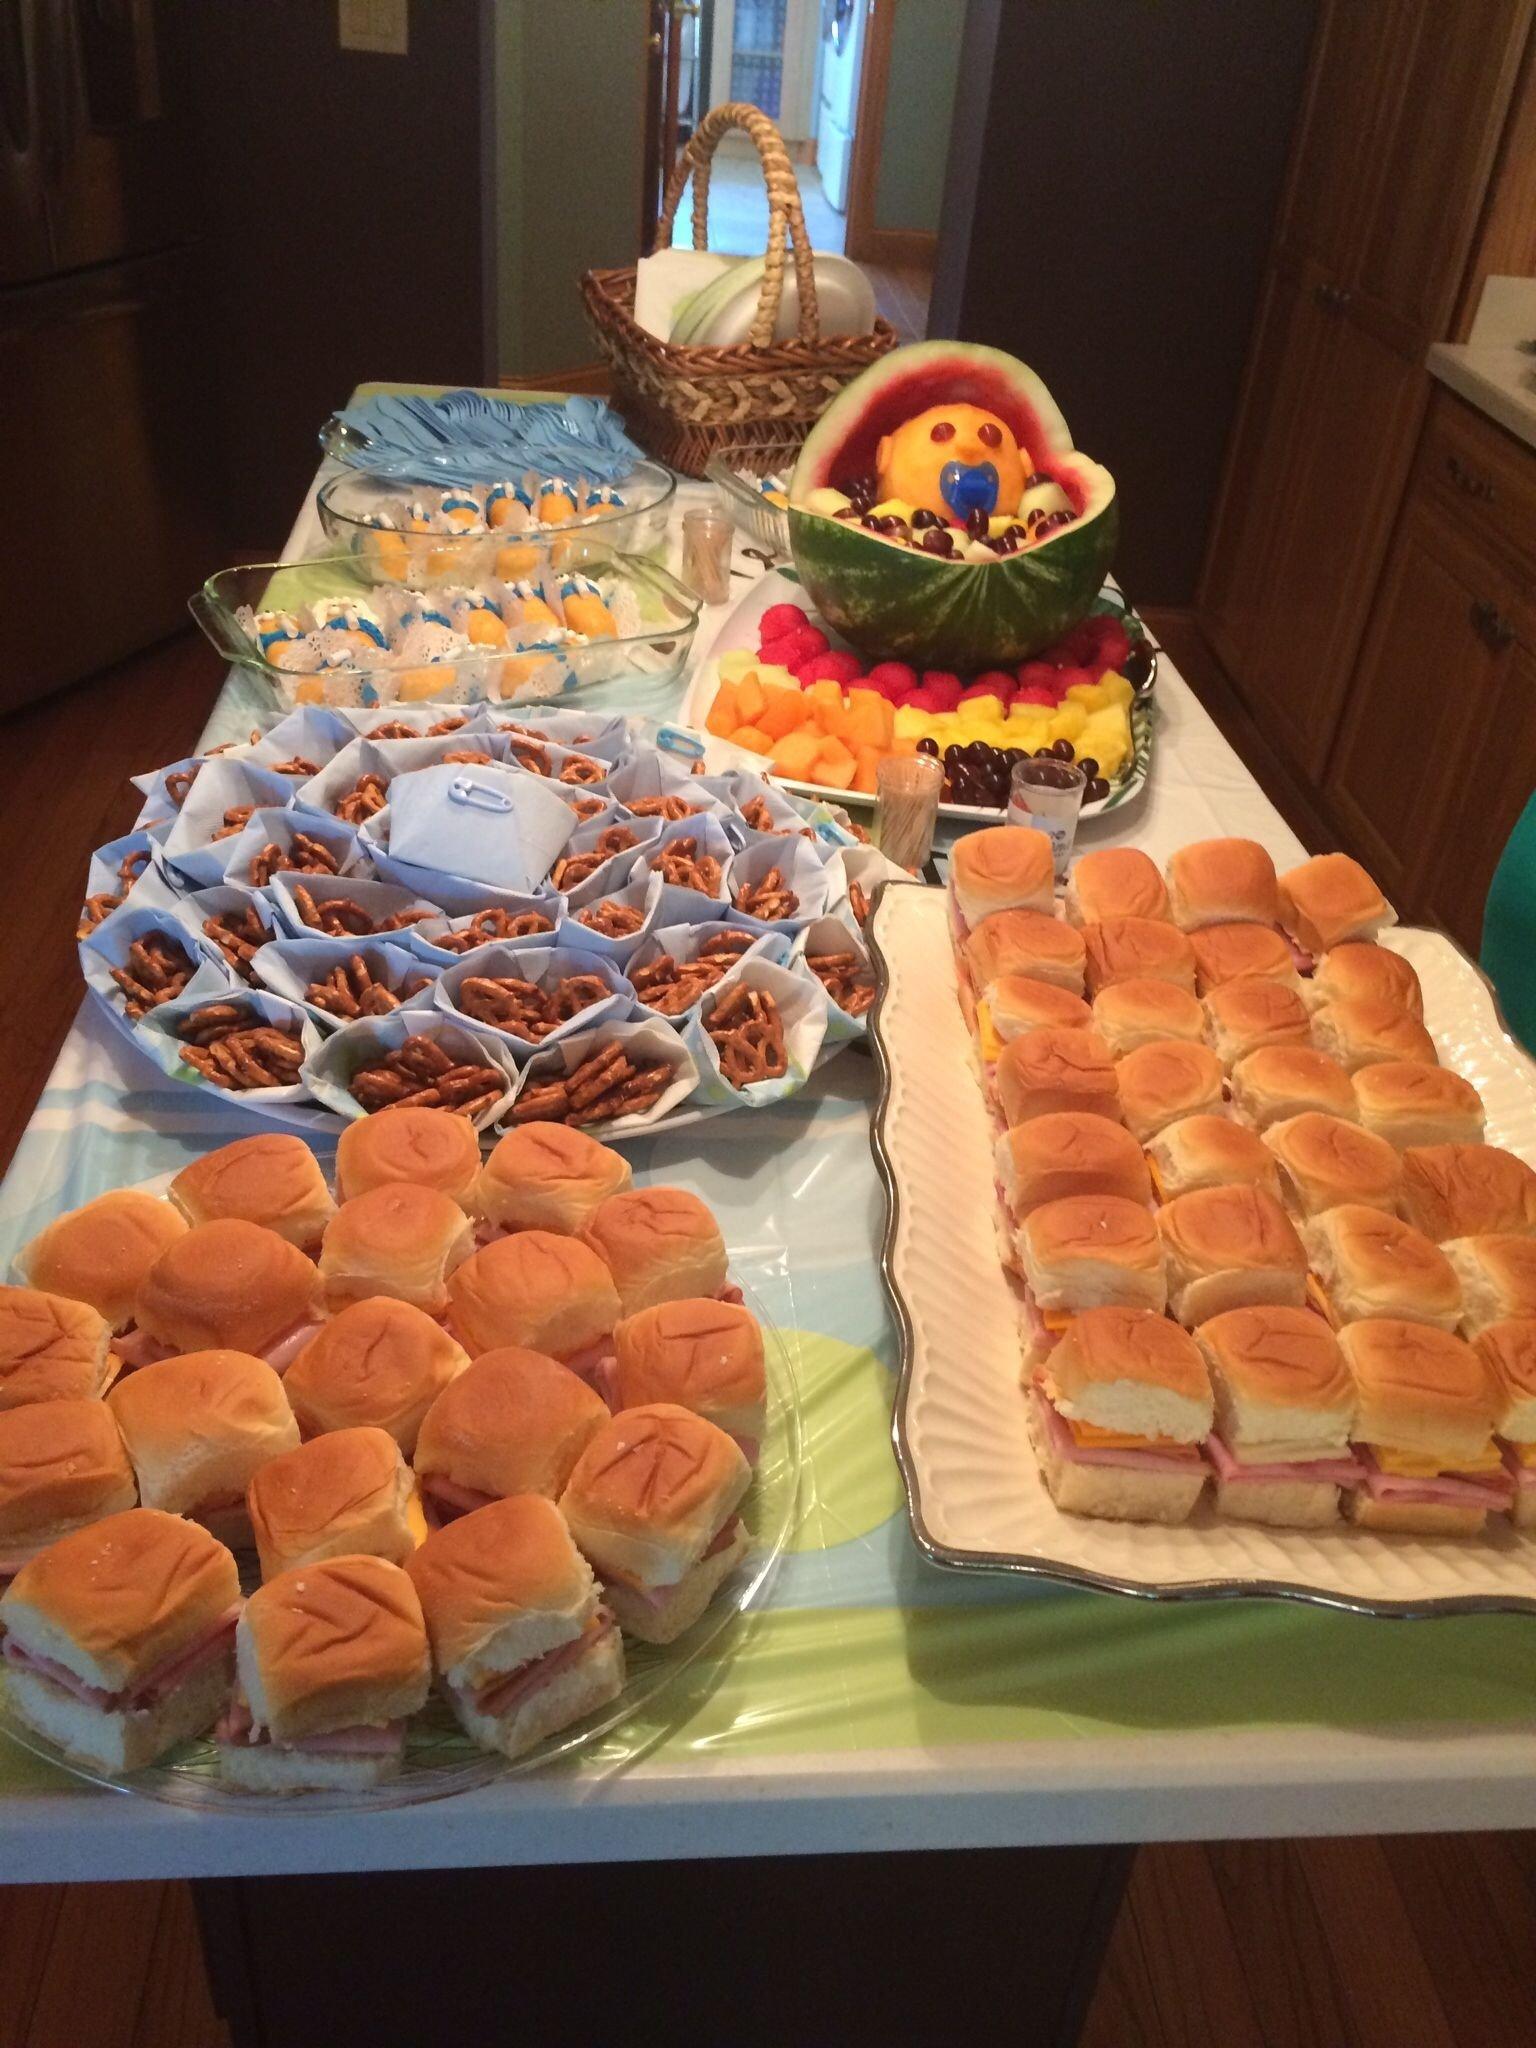 10 Best Cheap Baby Shower Food Ideas baby shower food on a budget sandwiches on hawaiian rolls pretzel 5 2020